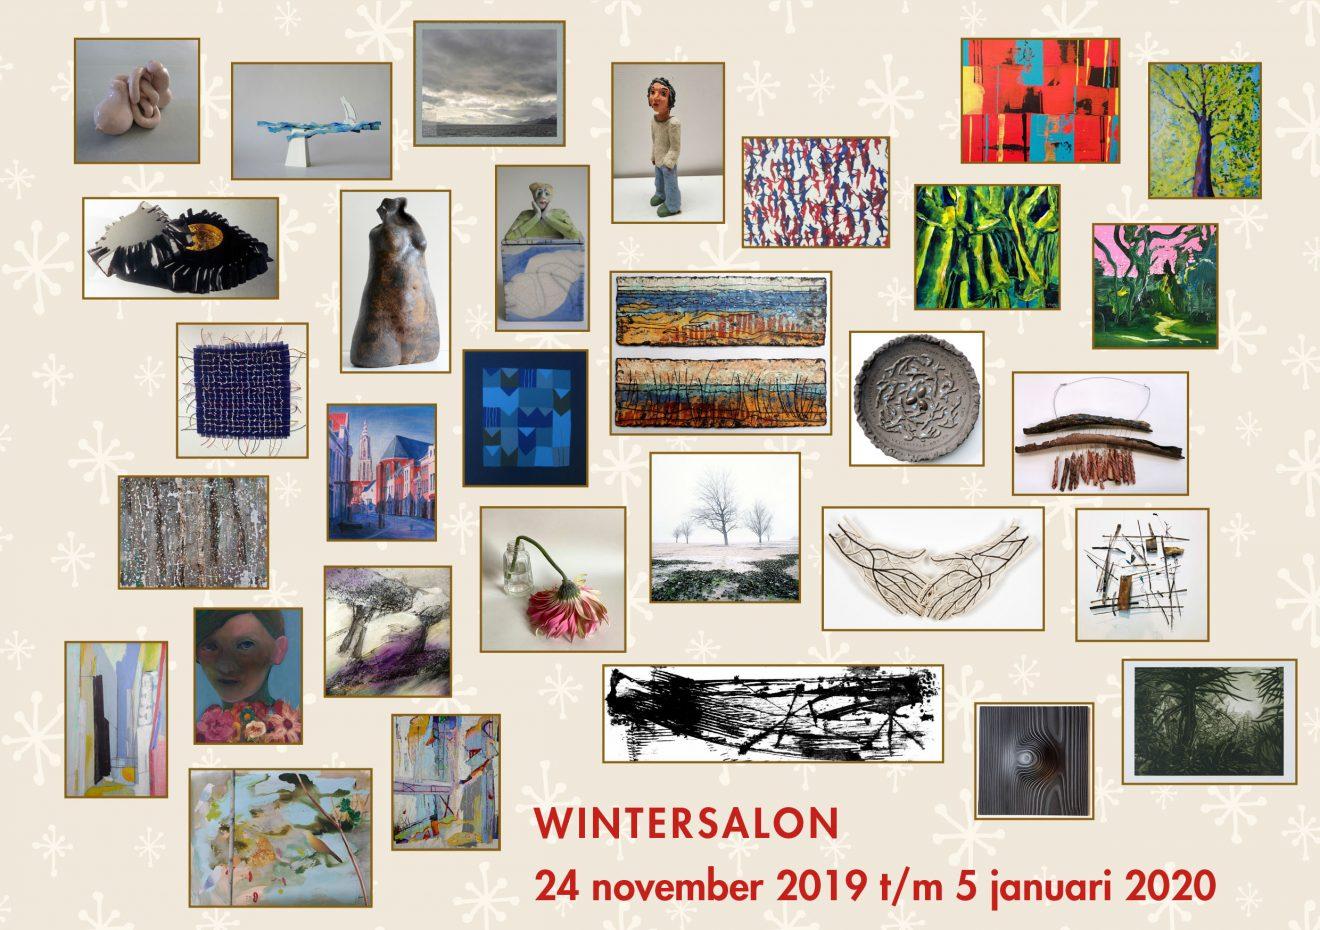 Wintersalon @ Galerie De Ploegh